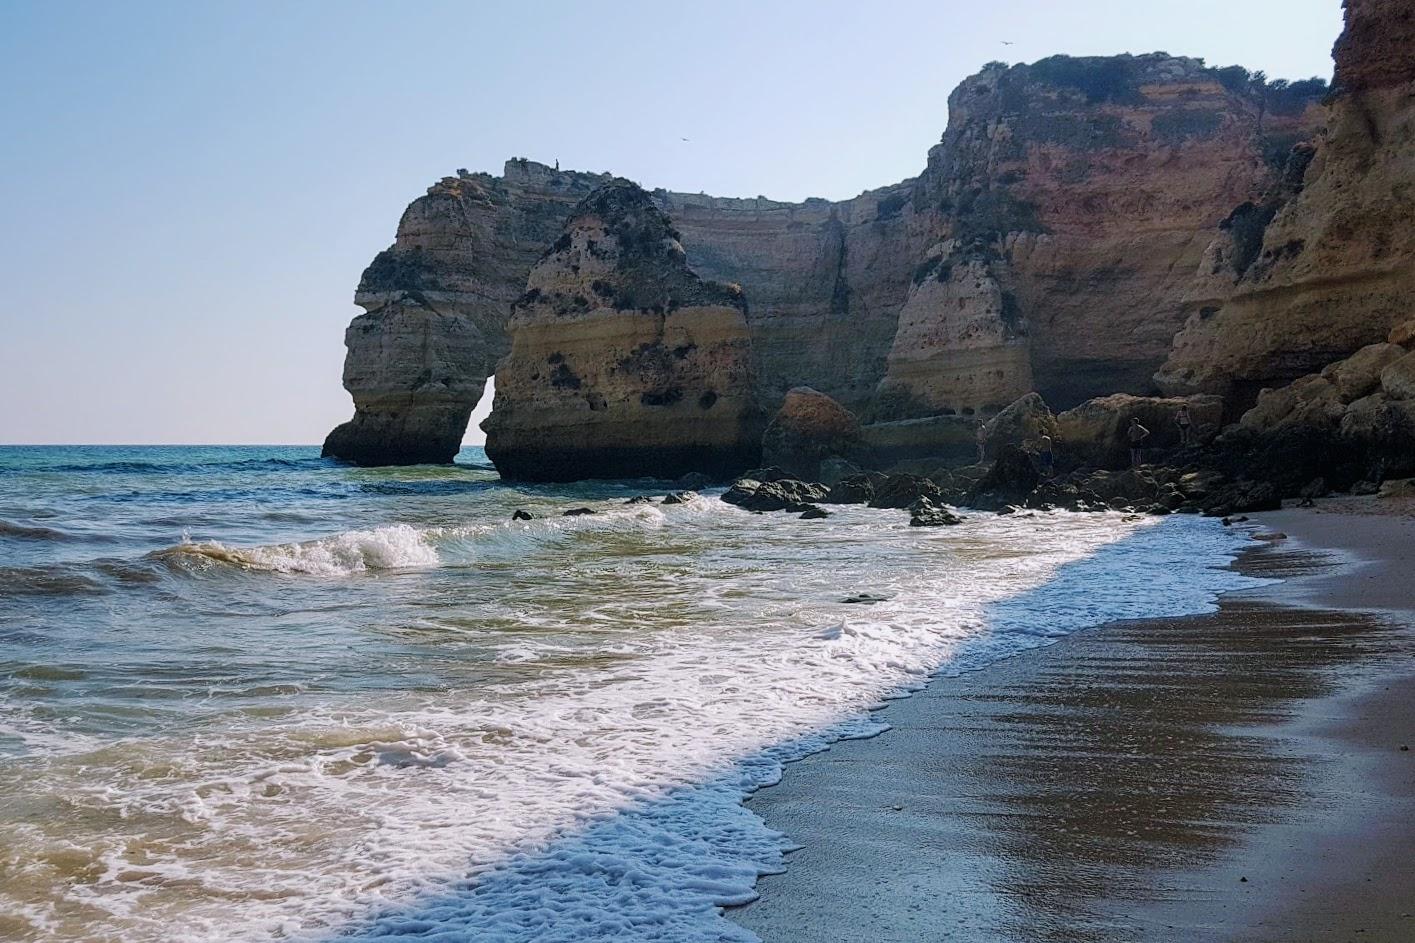 Praia da Mesquita